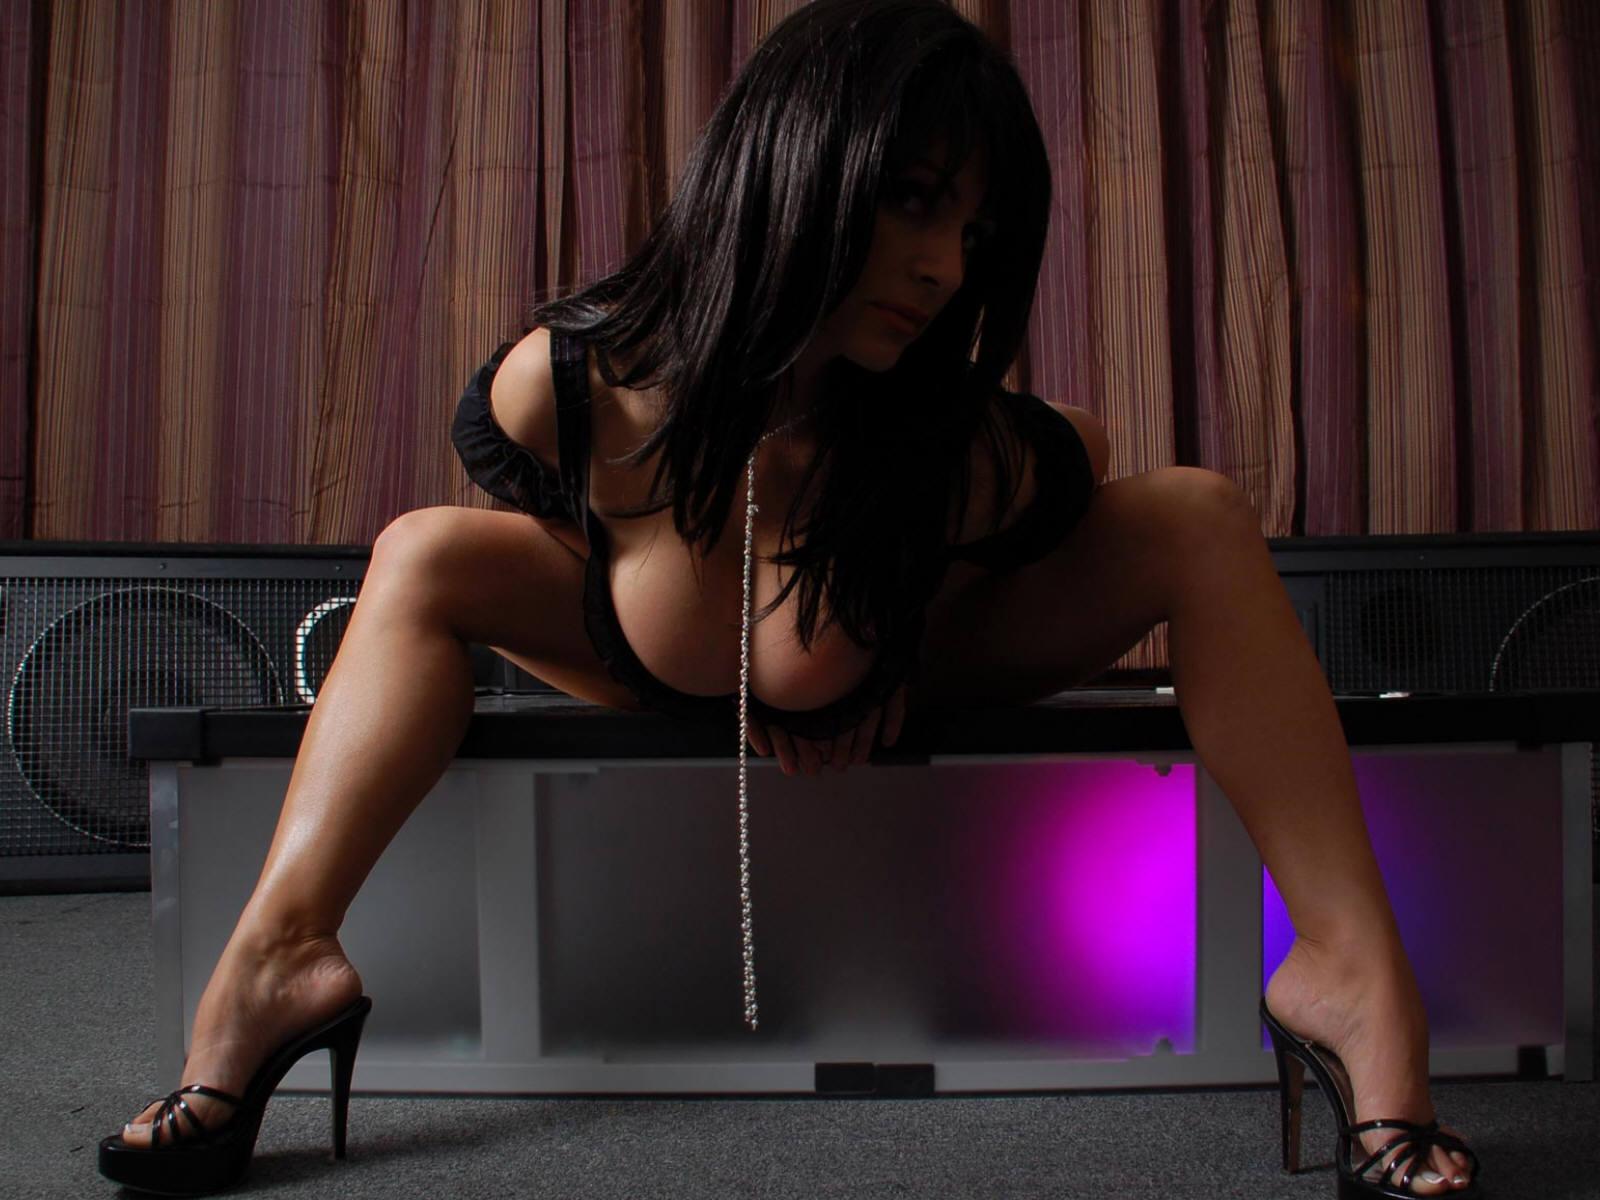 http://2.bp.blogspot.com/-sSJKTe8rPgw/TVVc_MsvoHI/AAAAAAAAB94/uOzoXVh7WoM/s1600/Sexy%2BGirls%2B.%2B-%2BFreeHD.Blogspot.Com%2B%2B%2525286%252529.jpg